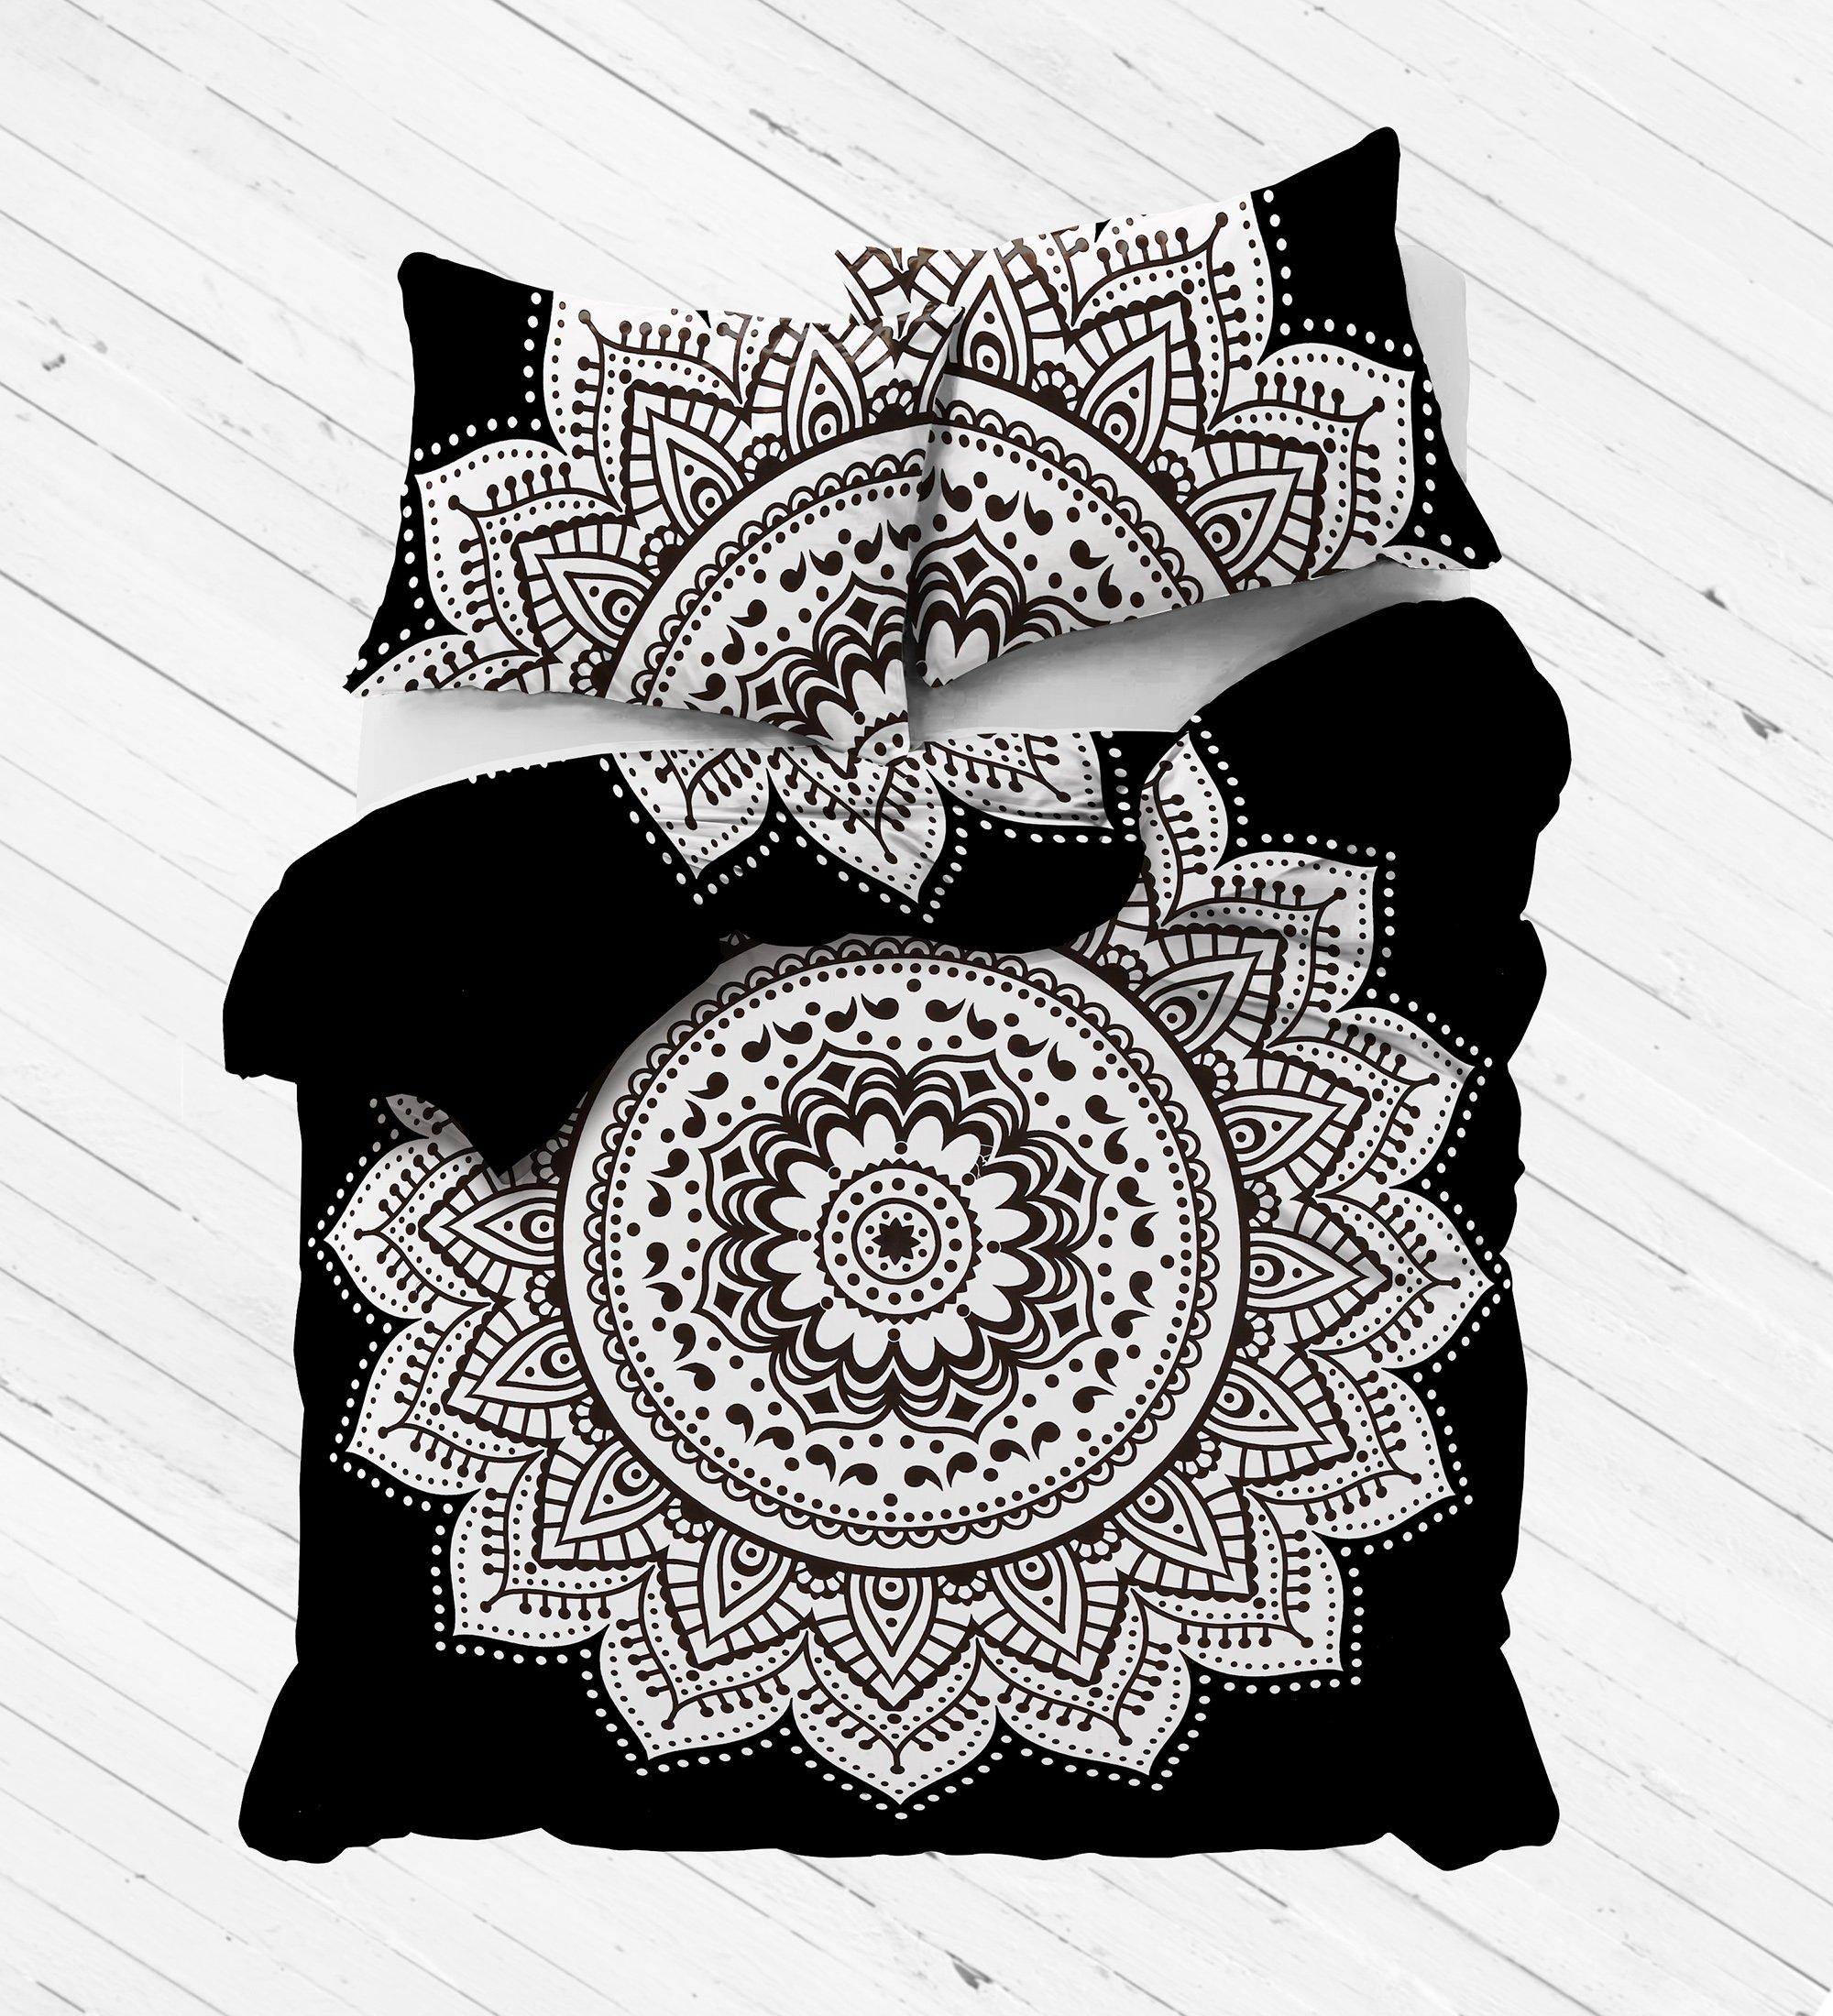 Madhu International Exclusive Black and White mandala duvet cover with pillowcases By, mandala bedding, mandala duvets, mandala bedroom decor, boho comforter cover